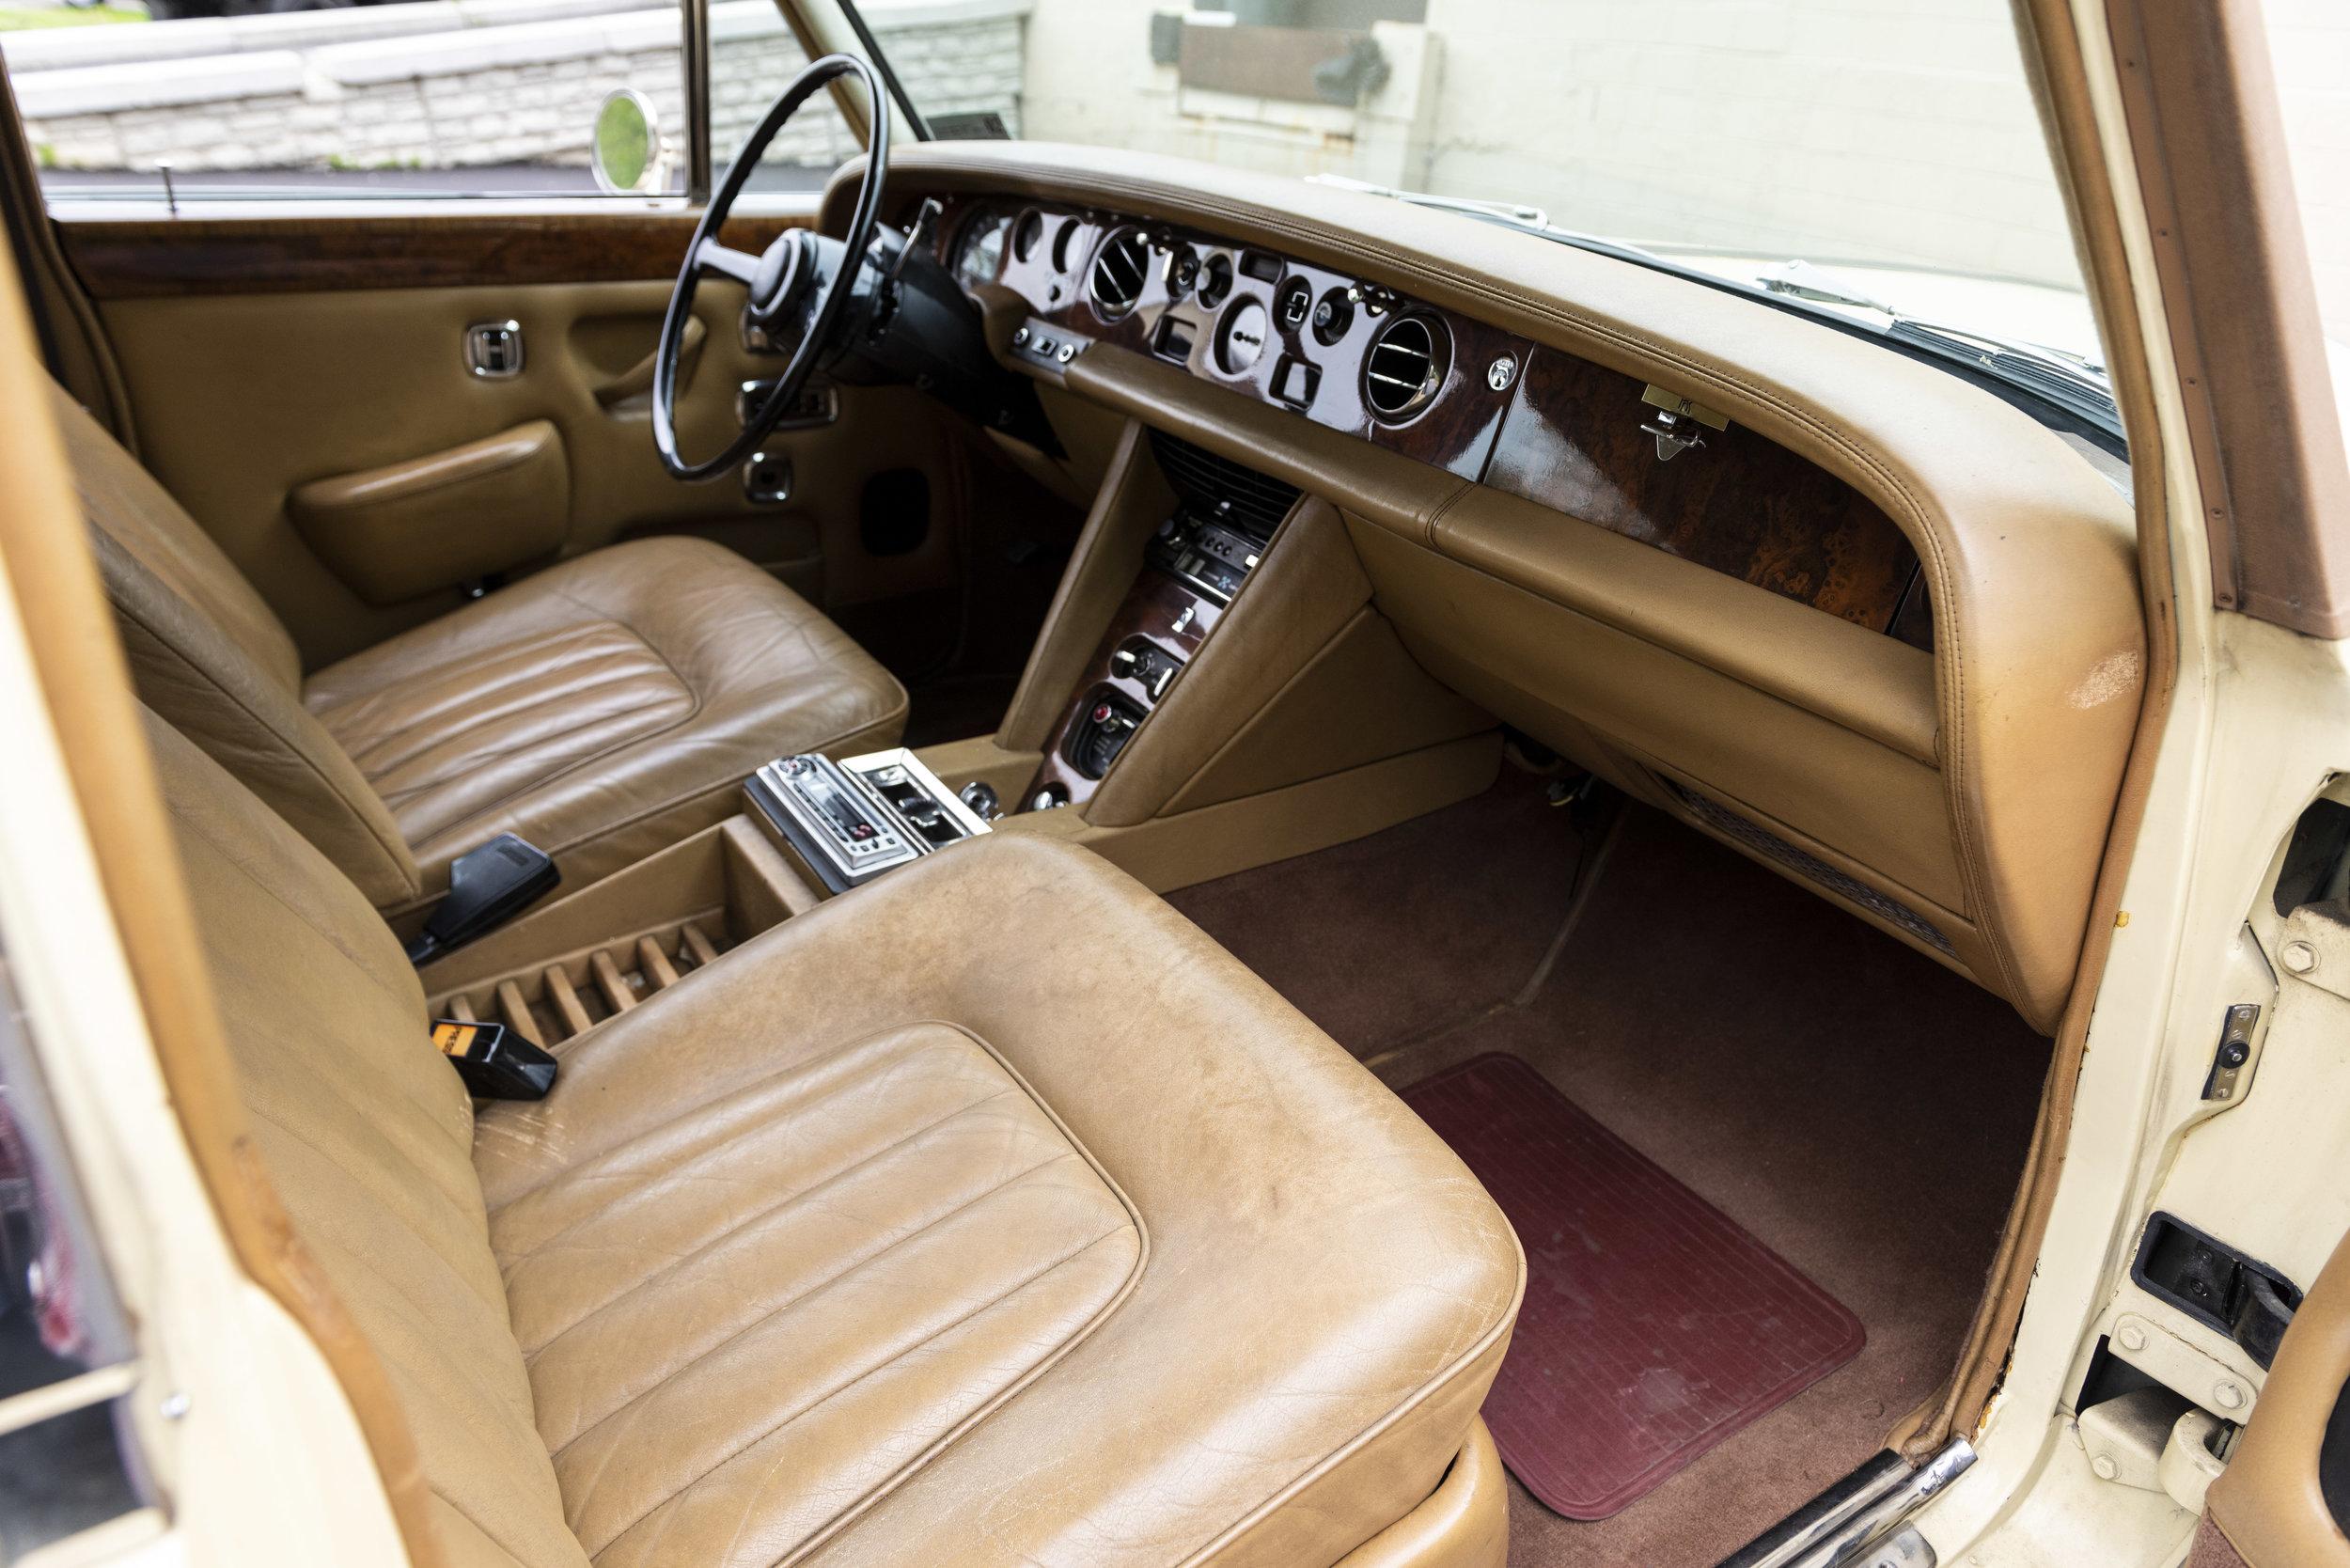 yellow rolls interiors_004.JPG